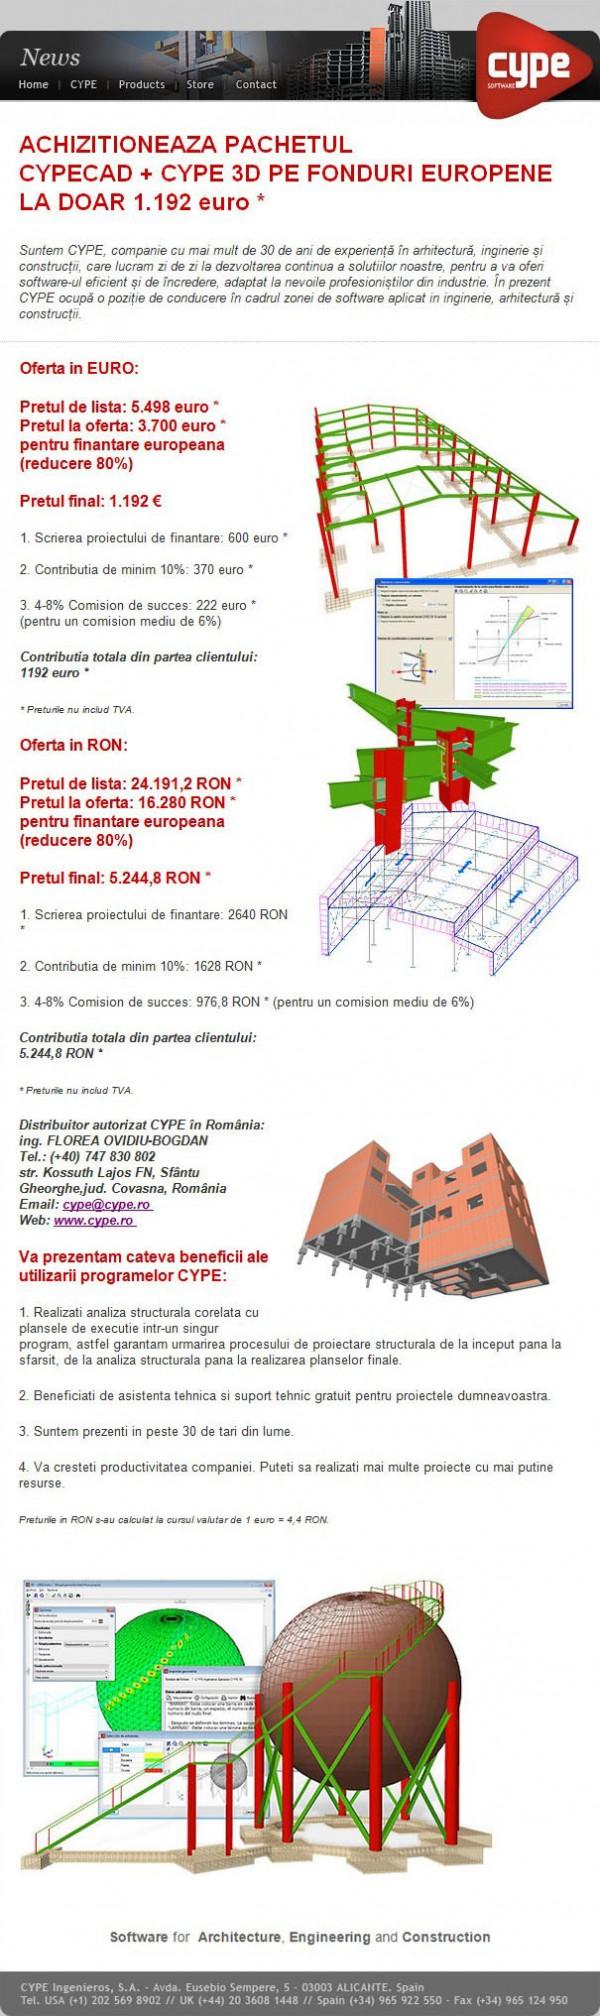 CYPECAD + CYPE 3D la doar 1.192 euro + TVA - CYPECAD + CYPE 3D la doar 1.192 euro + TVA poze